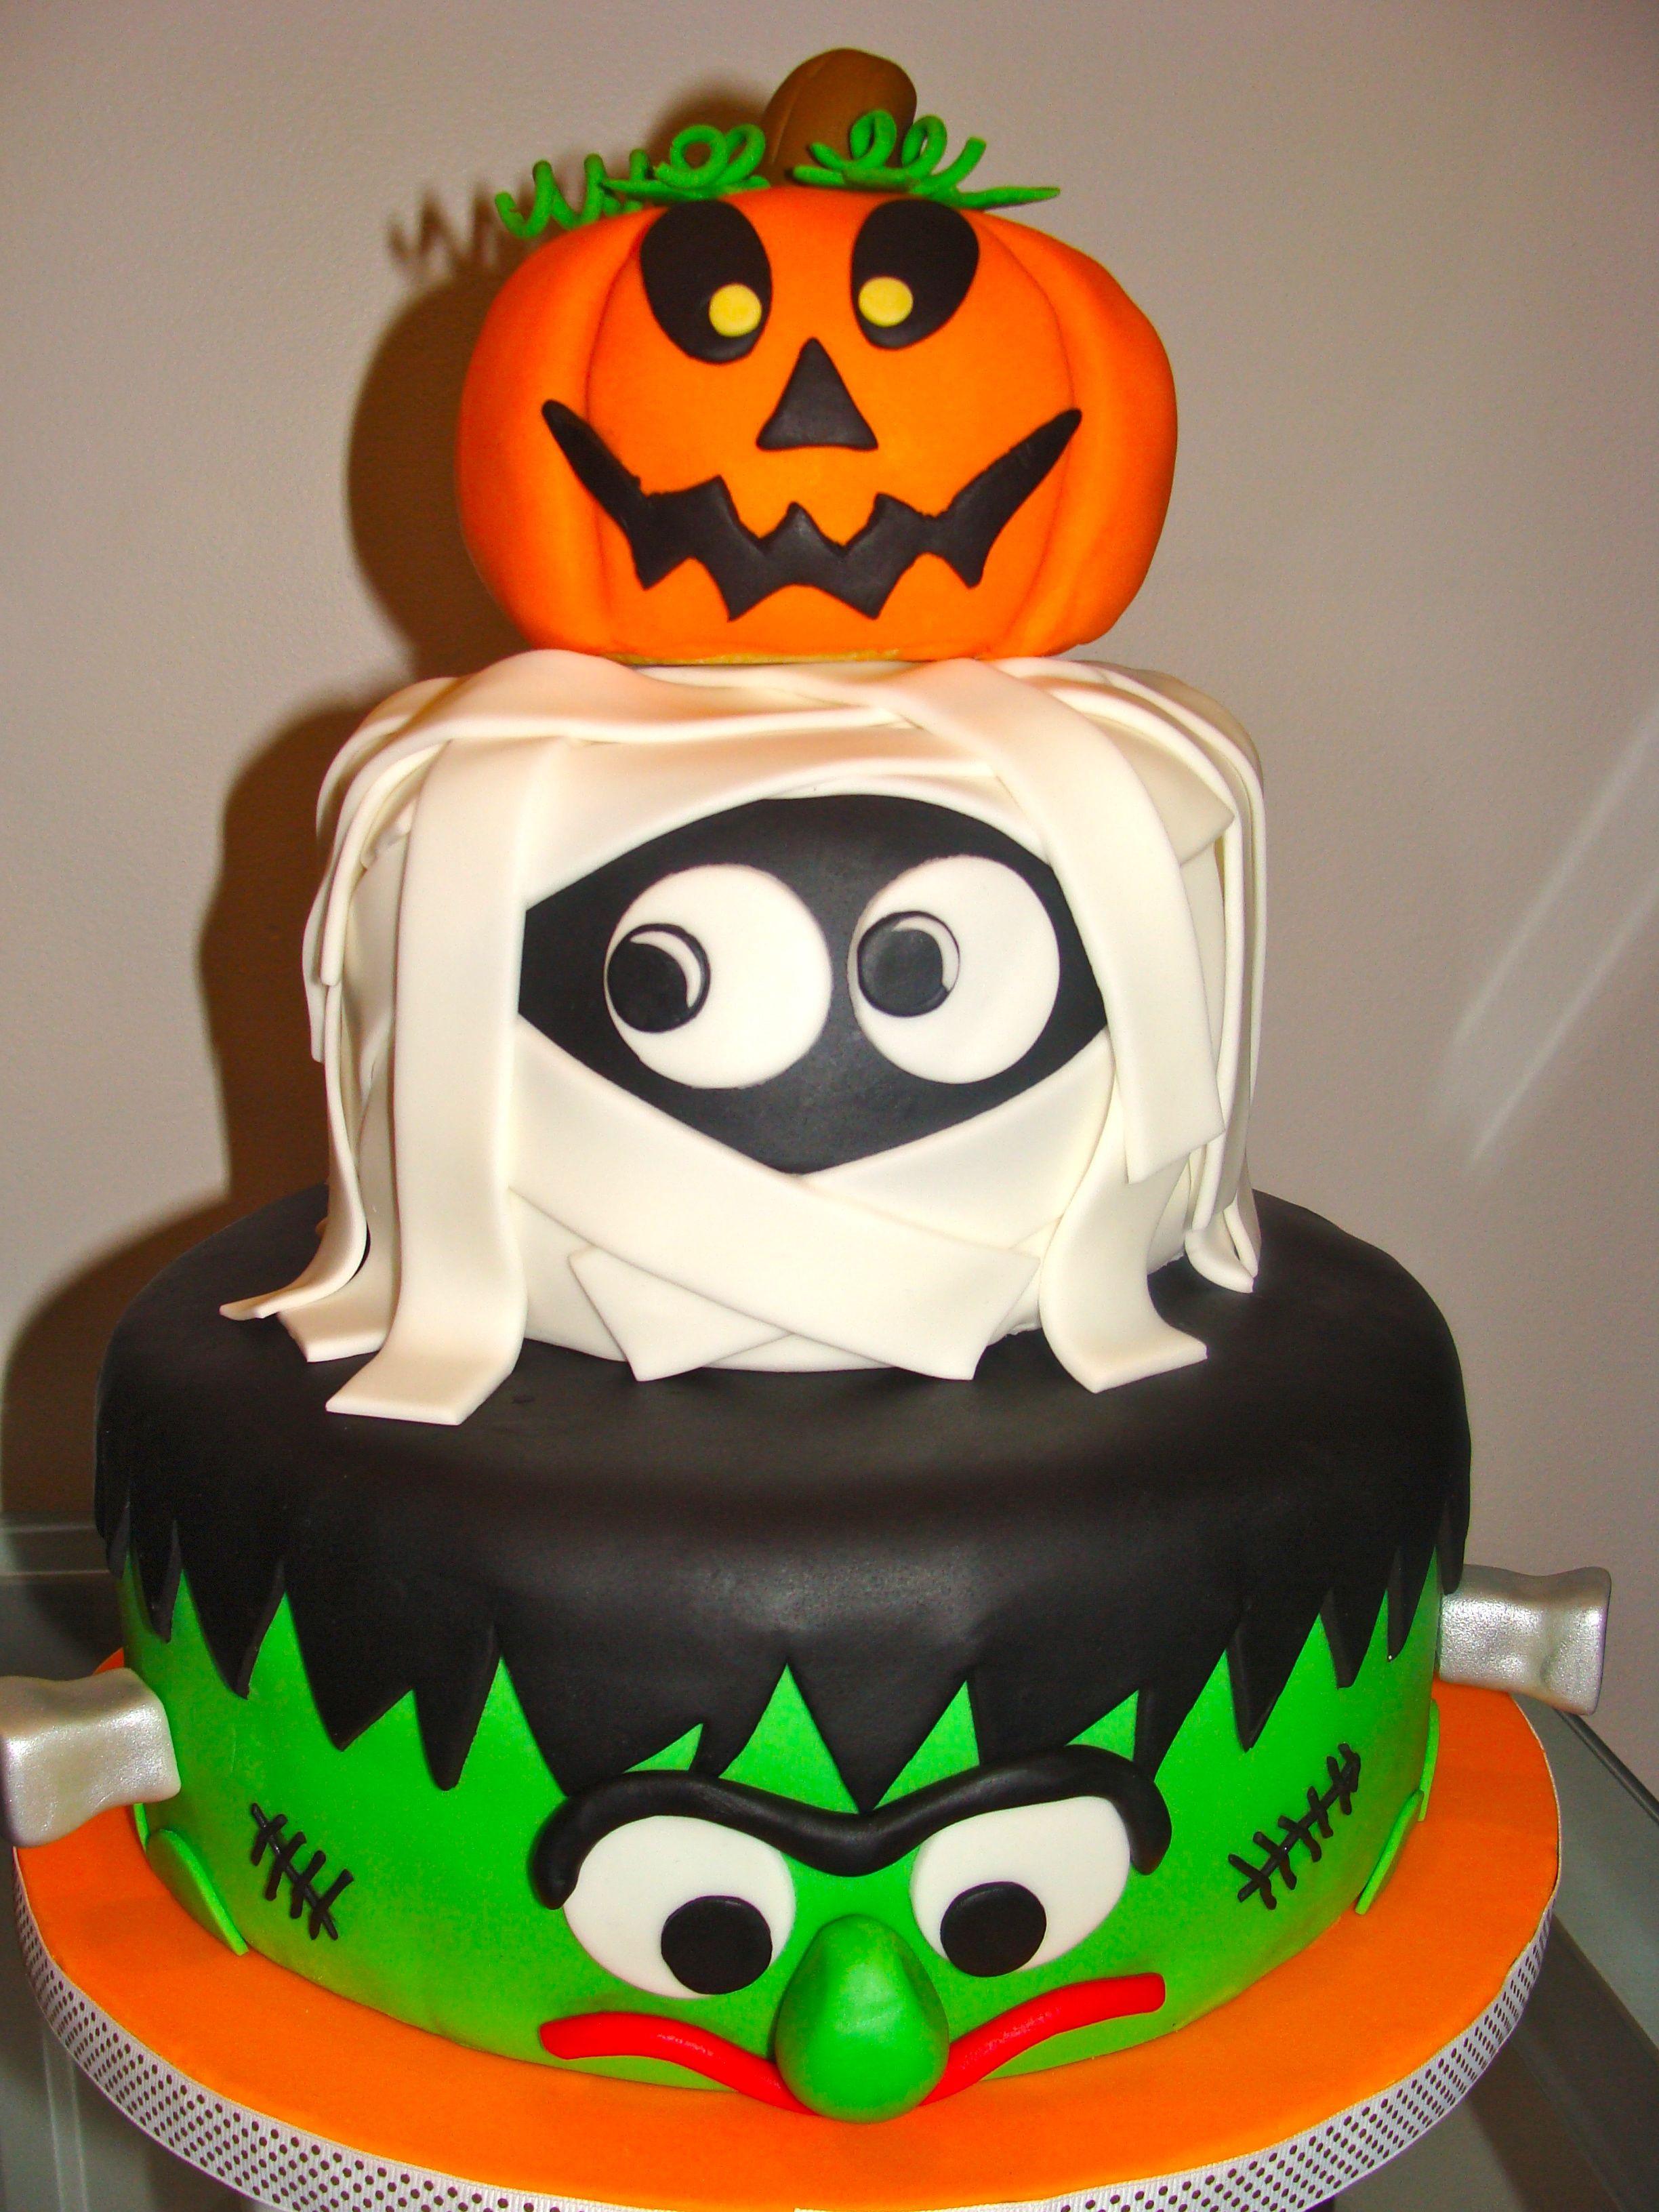 Cakes For Halloween  21 Amazing Halloween Cake Ideas Halloween cakes